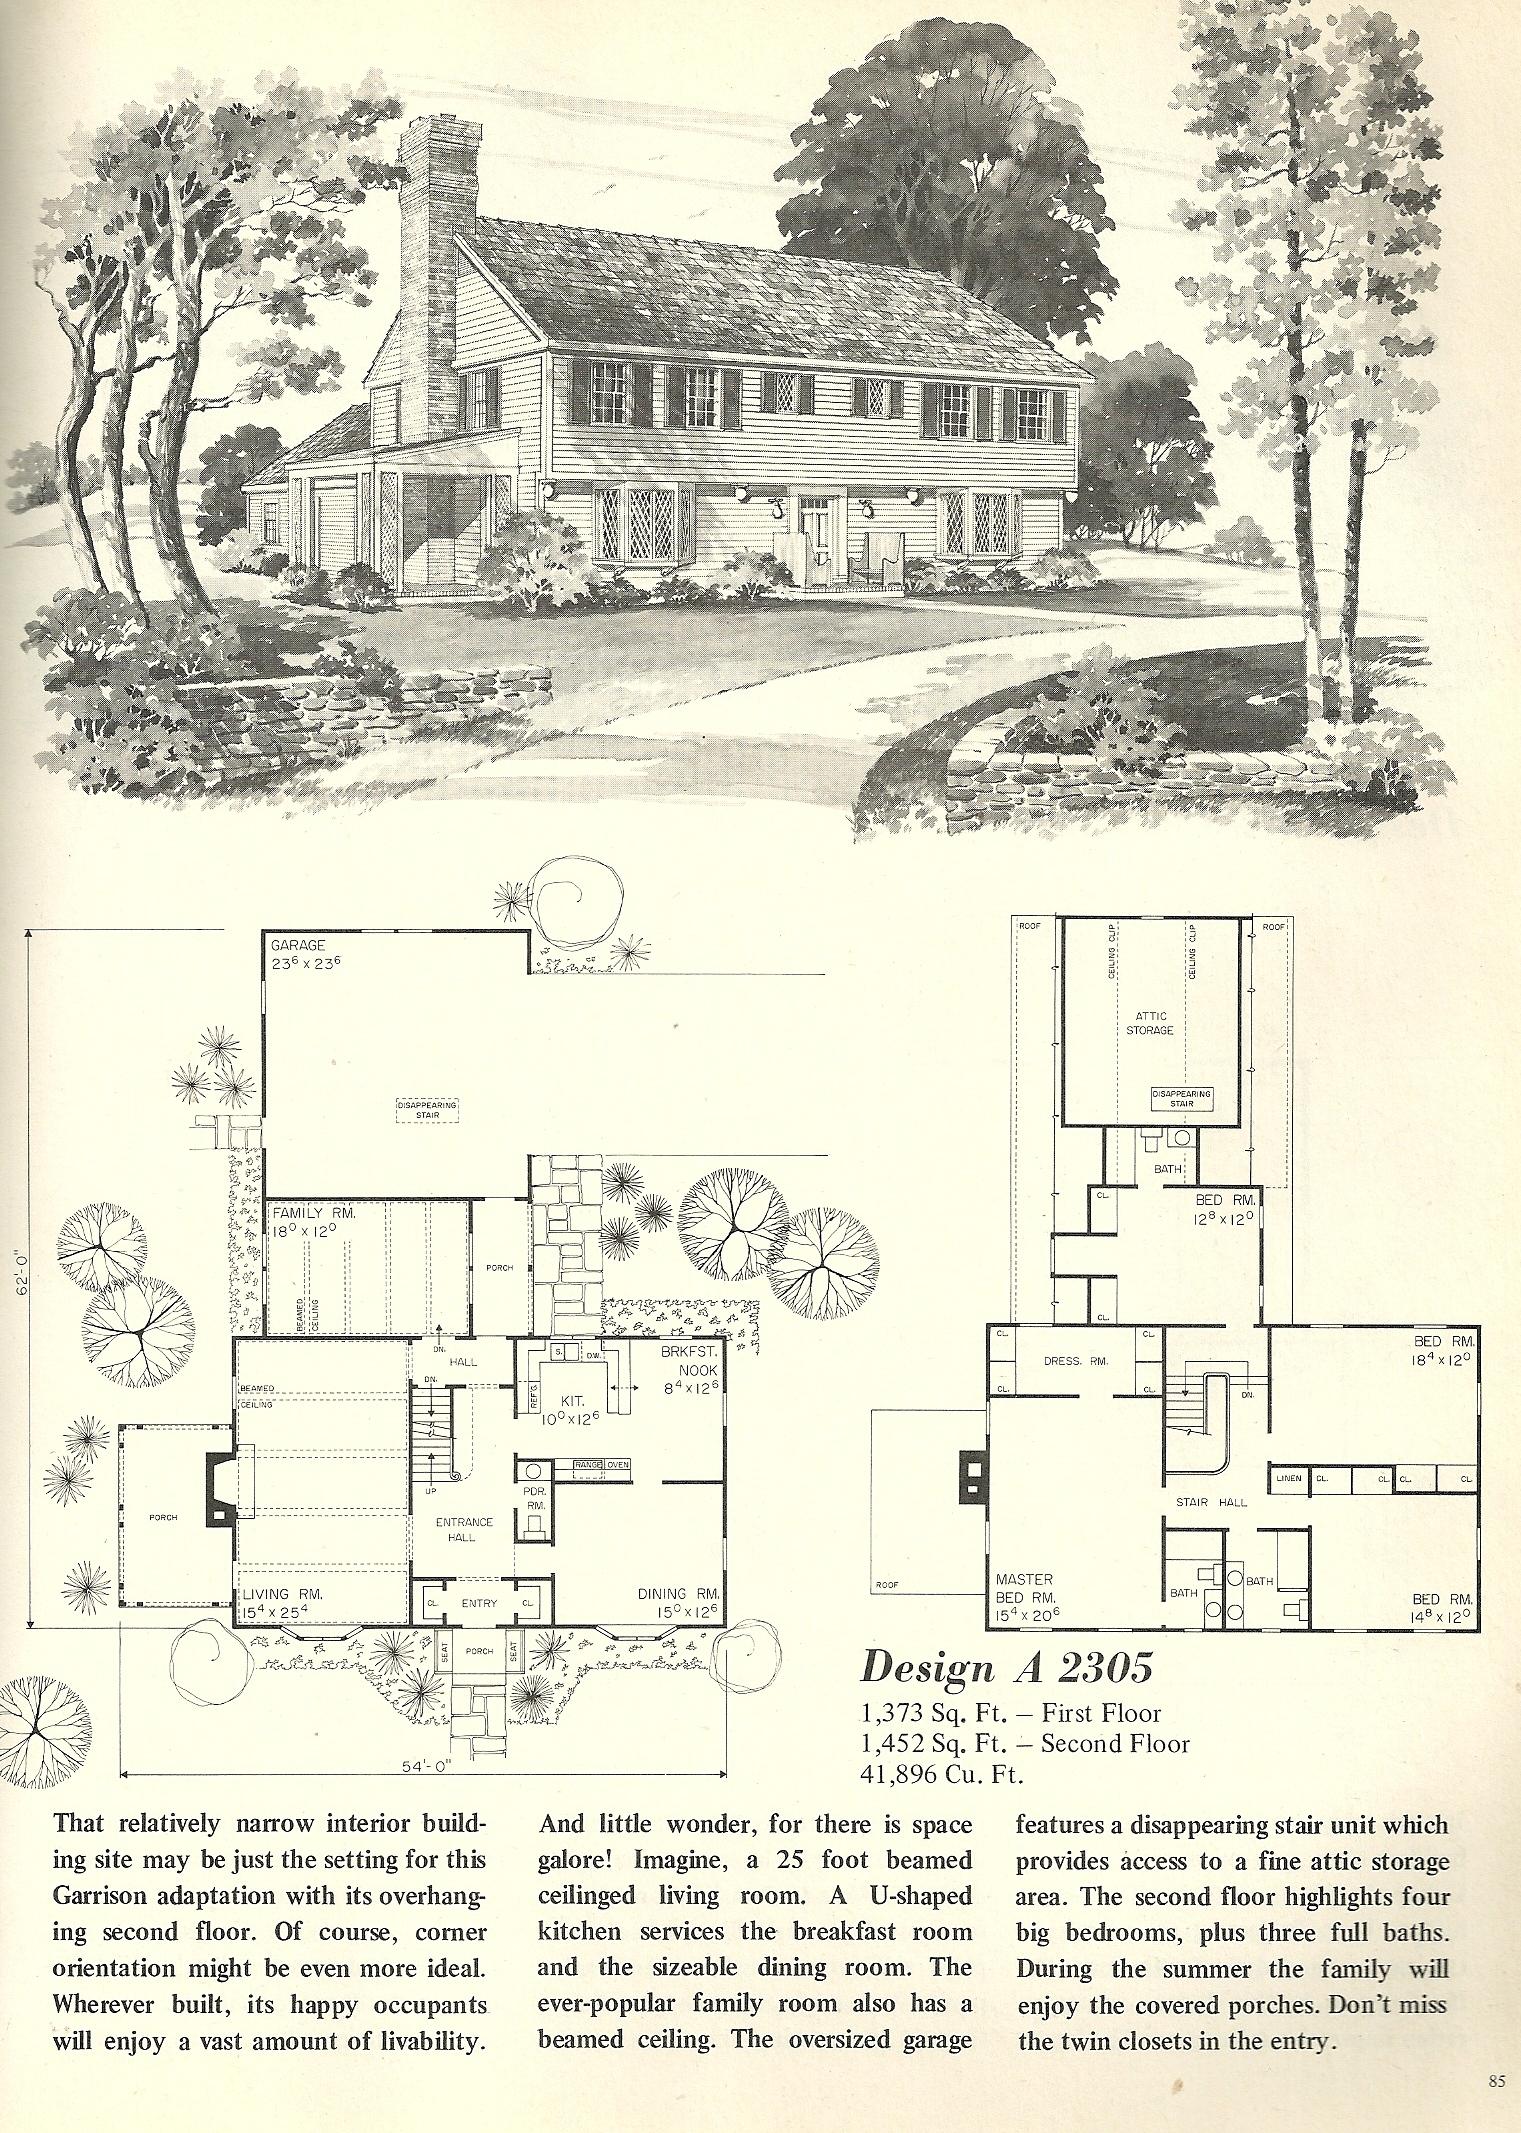 Vintage house plans 2305 antique alter ego for 1970s house plans